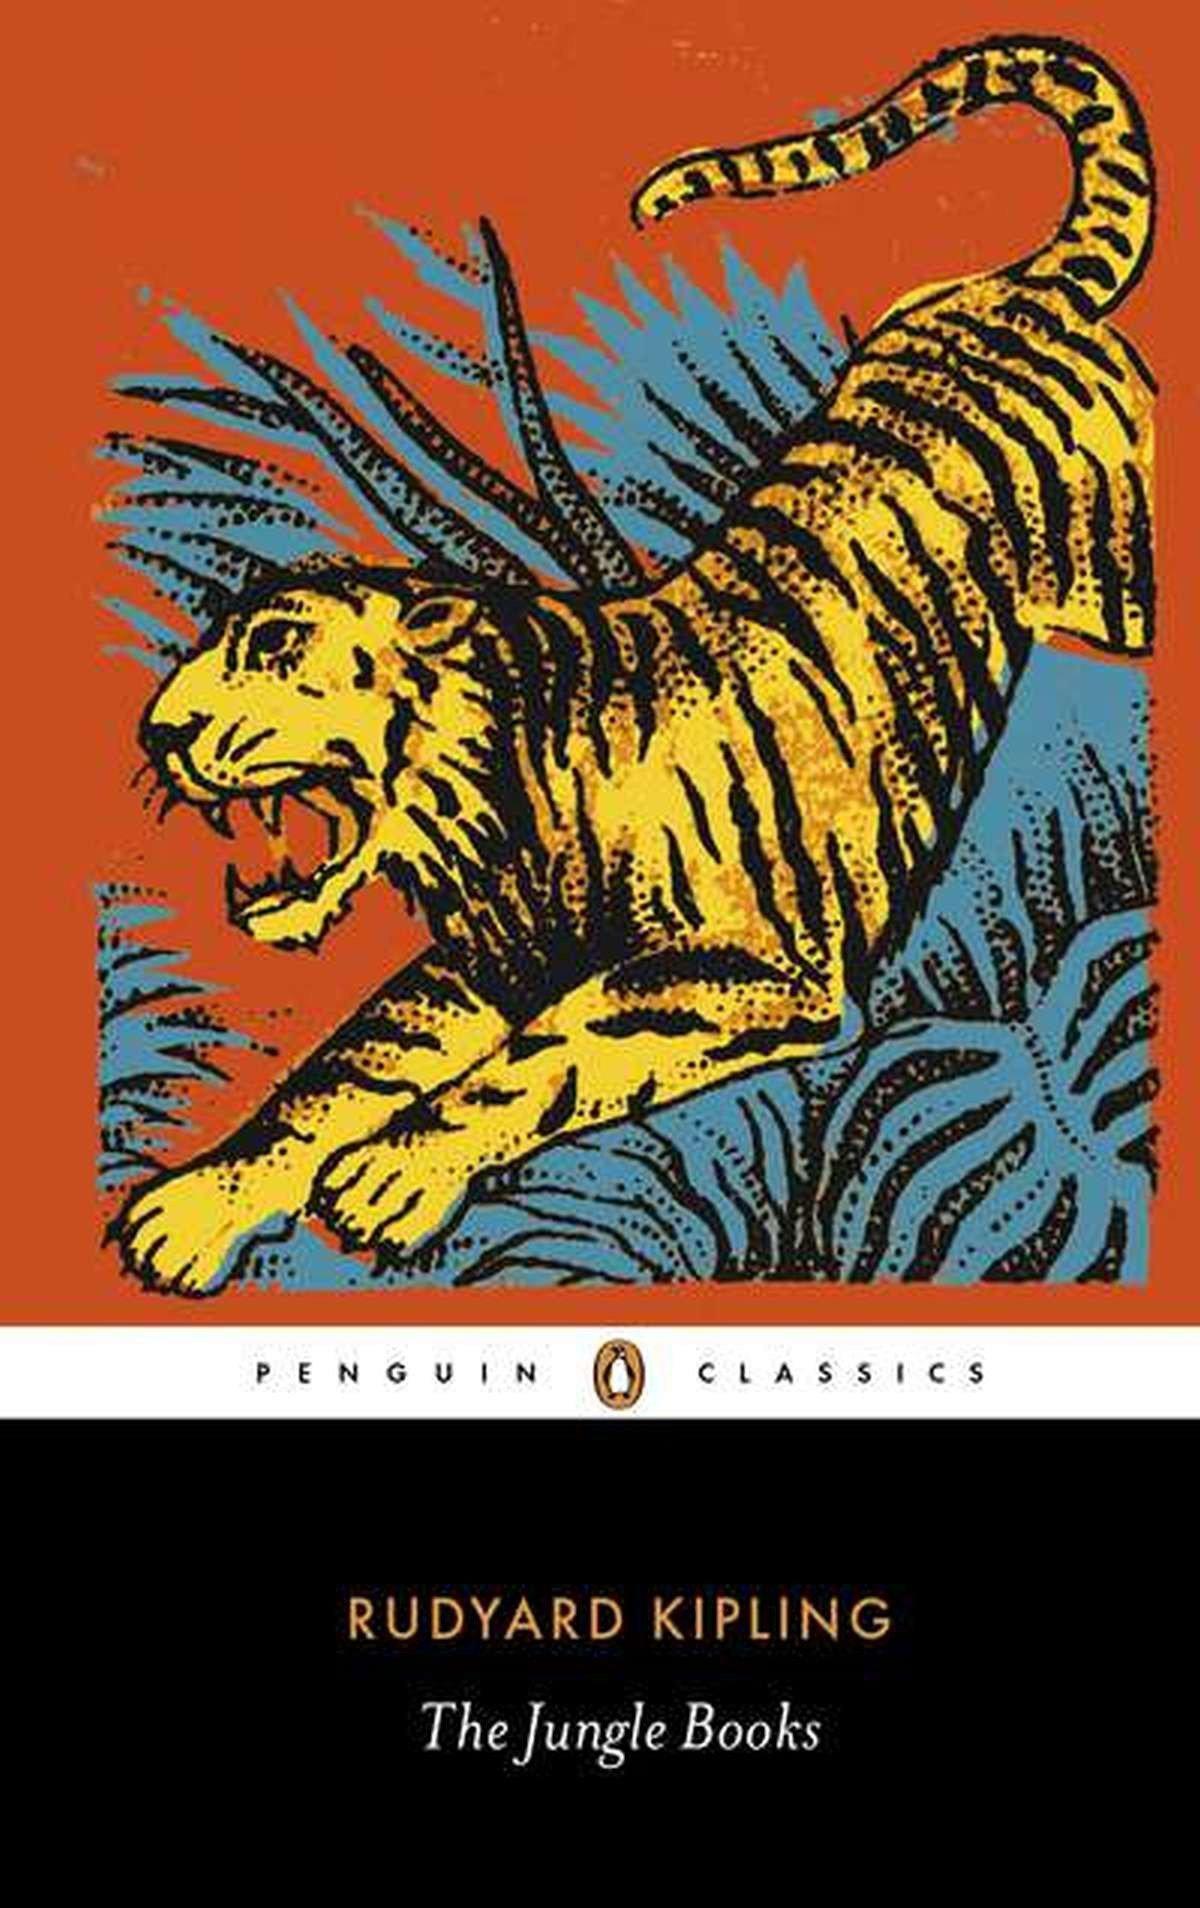 The Jungle Books (Penguin Classics): Amazon.de: Rudyard Kipling ...